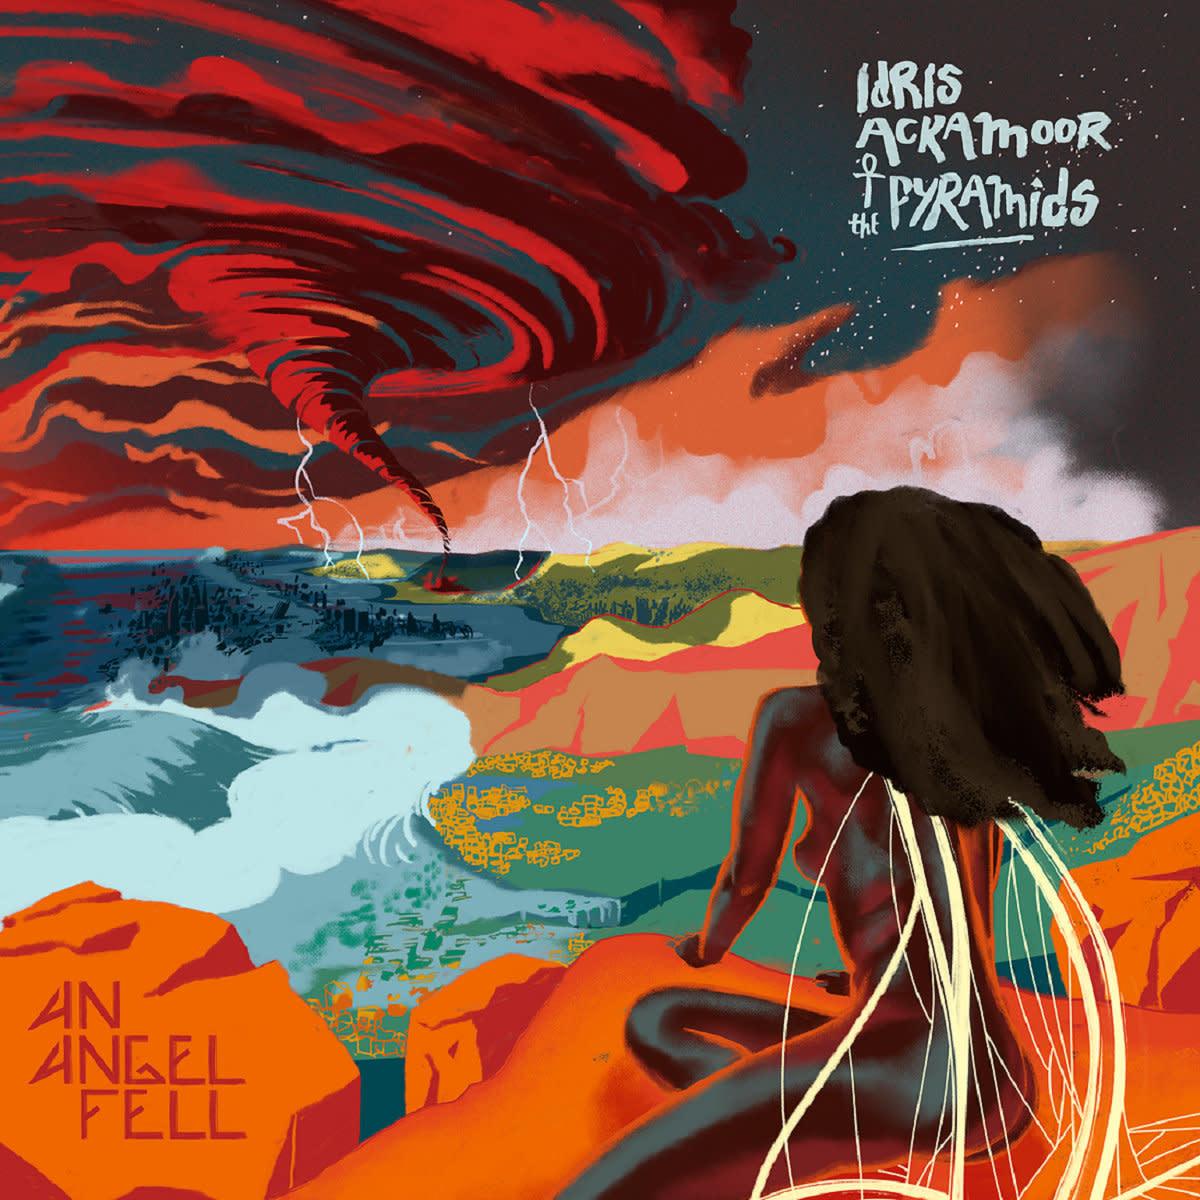 Idris Ackamoor & The Pyramids • An Angel Fell-1